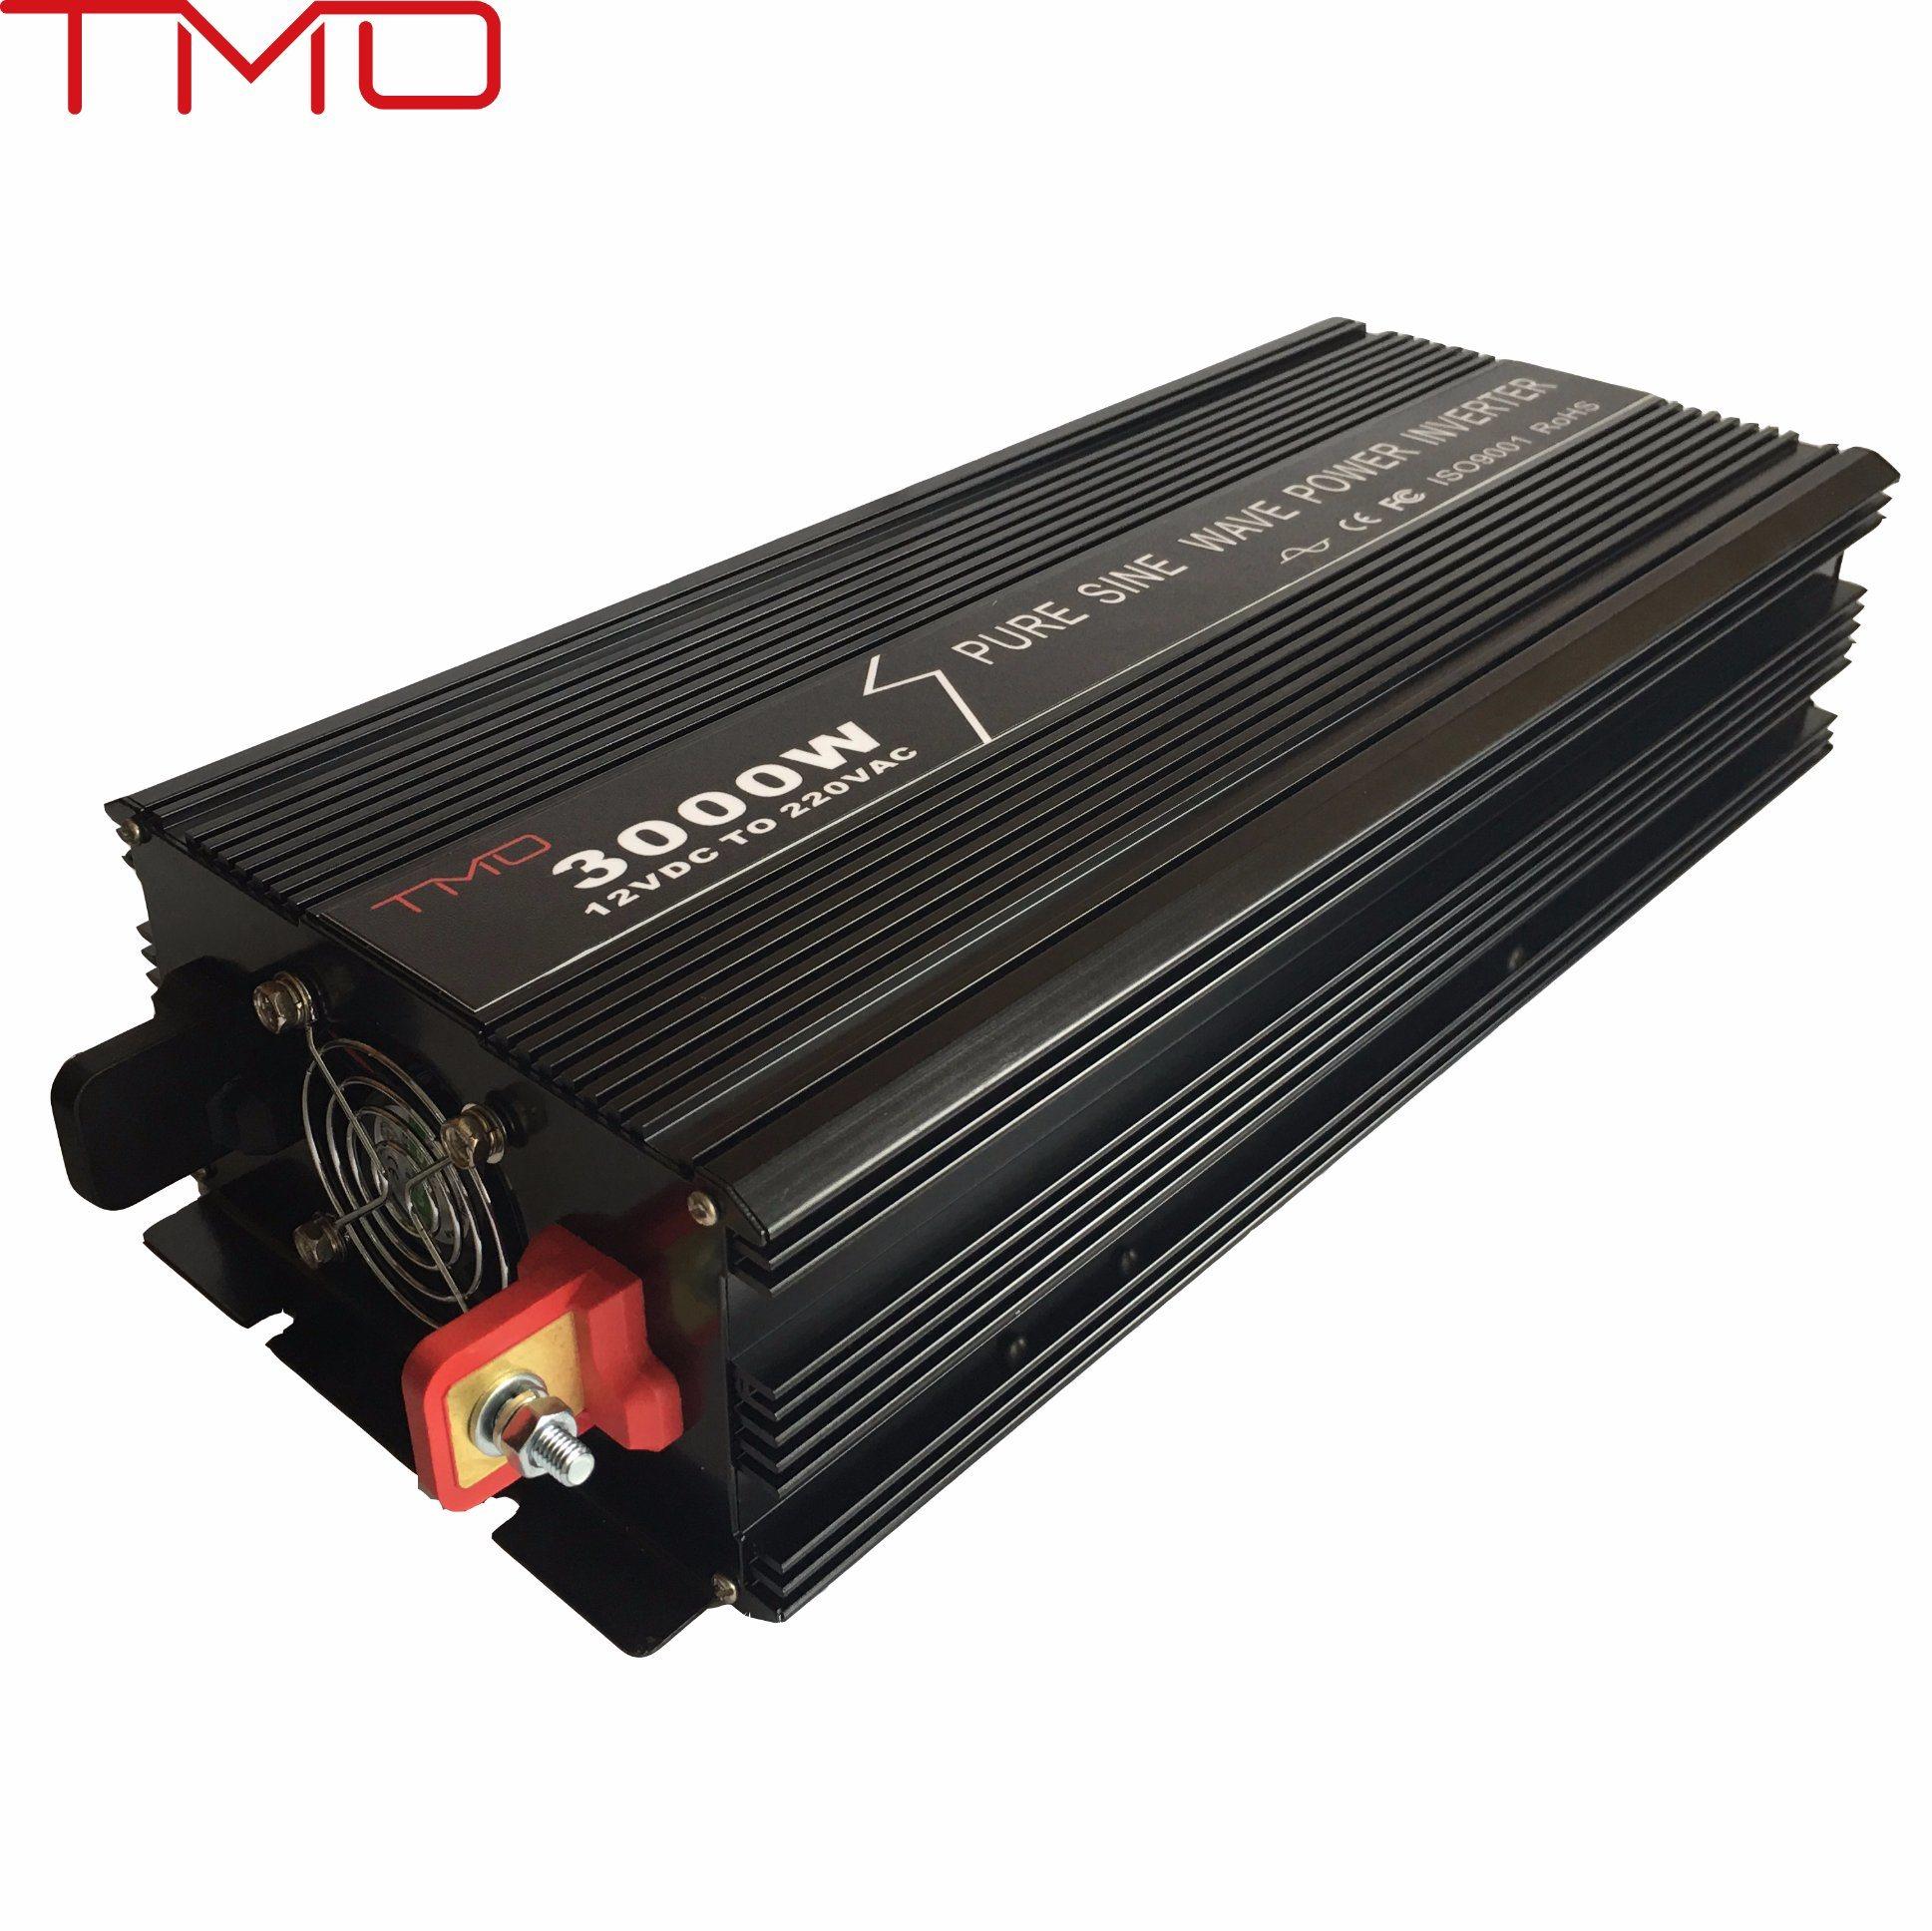 3000 Watt Intelligent Power Inverter DC 12V AC 220V 3000W Inverter Auto Pure Sine Wave off Grid Solar Inverter